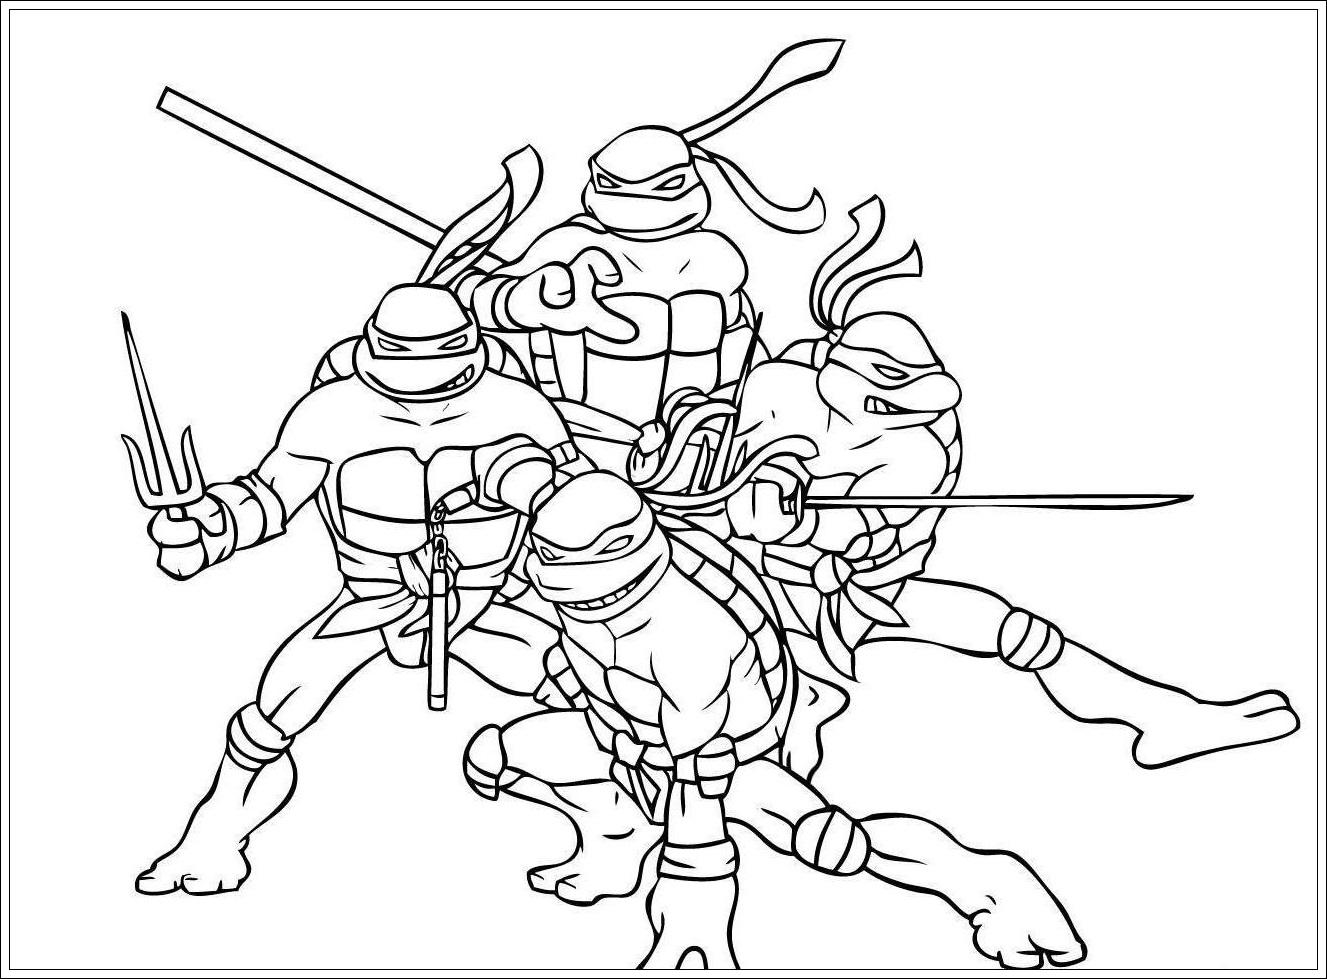 Beste Malvorlagen Schildkröten Ninja Ideen - Entry Level Resume ...